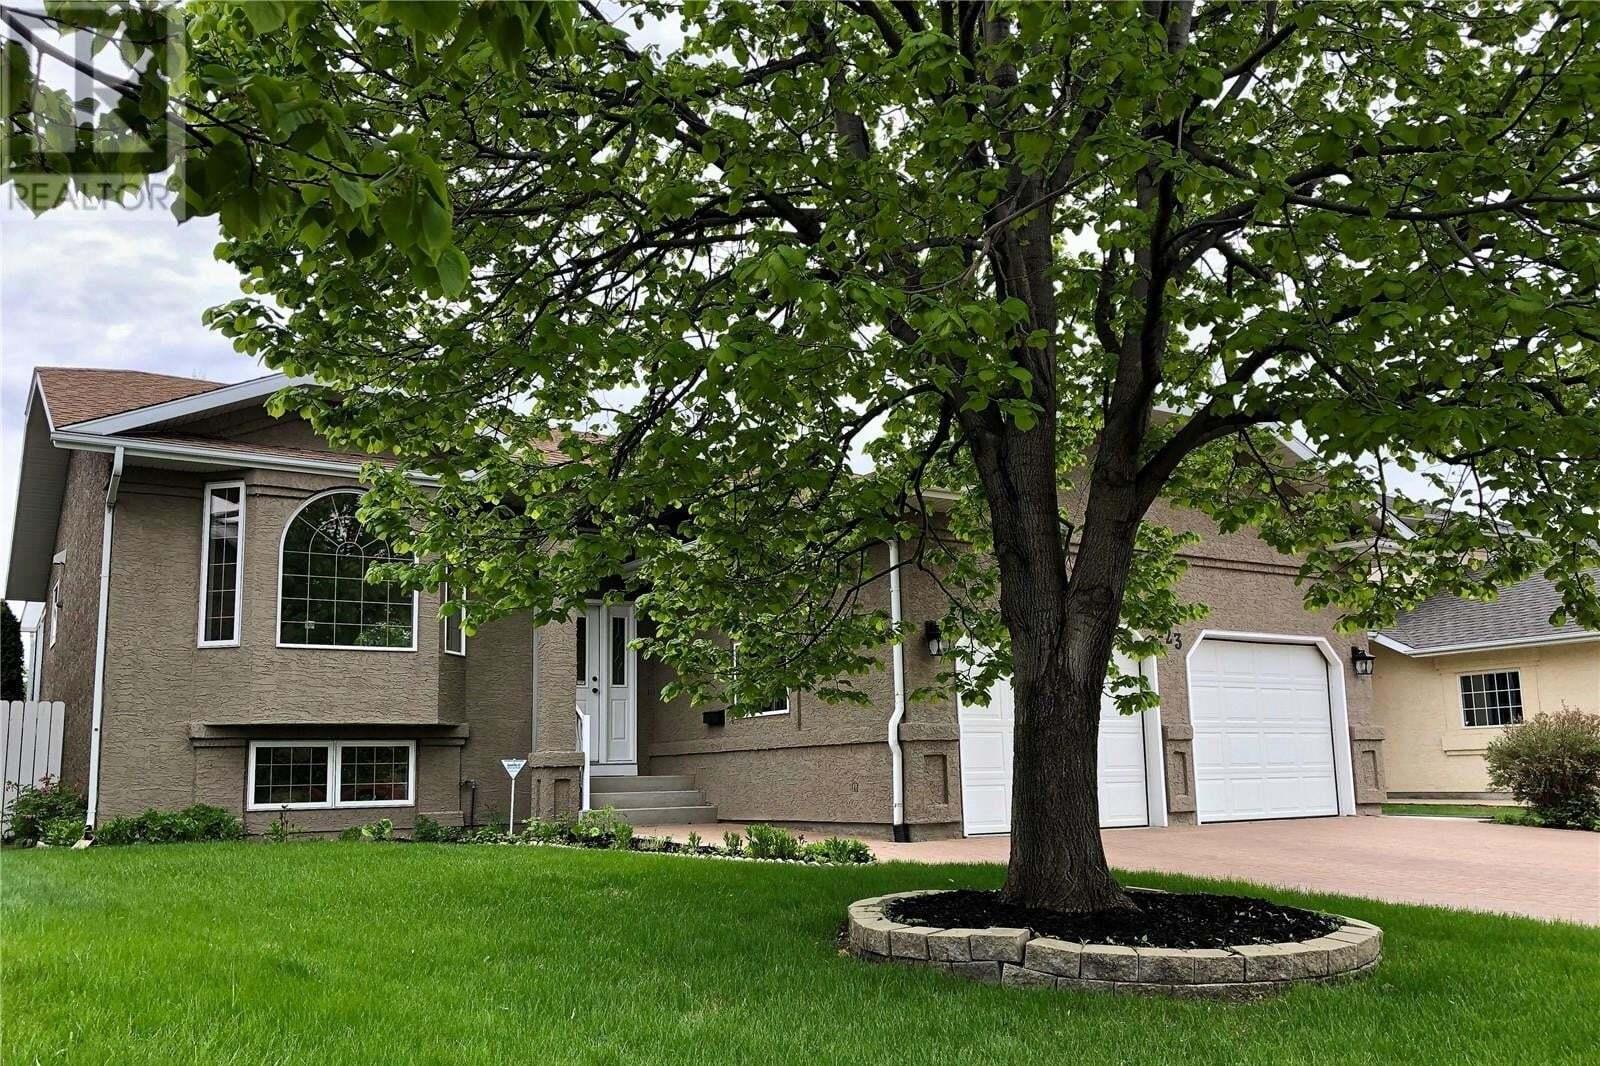 House for sale at 123 Mendel Cres Saskatoon Saskatchewan - MLS: SK810351